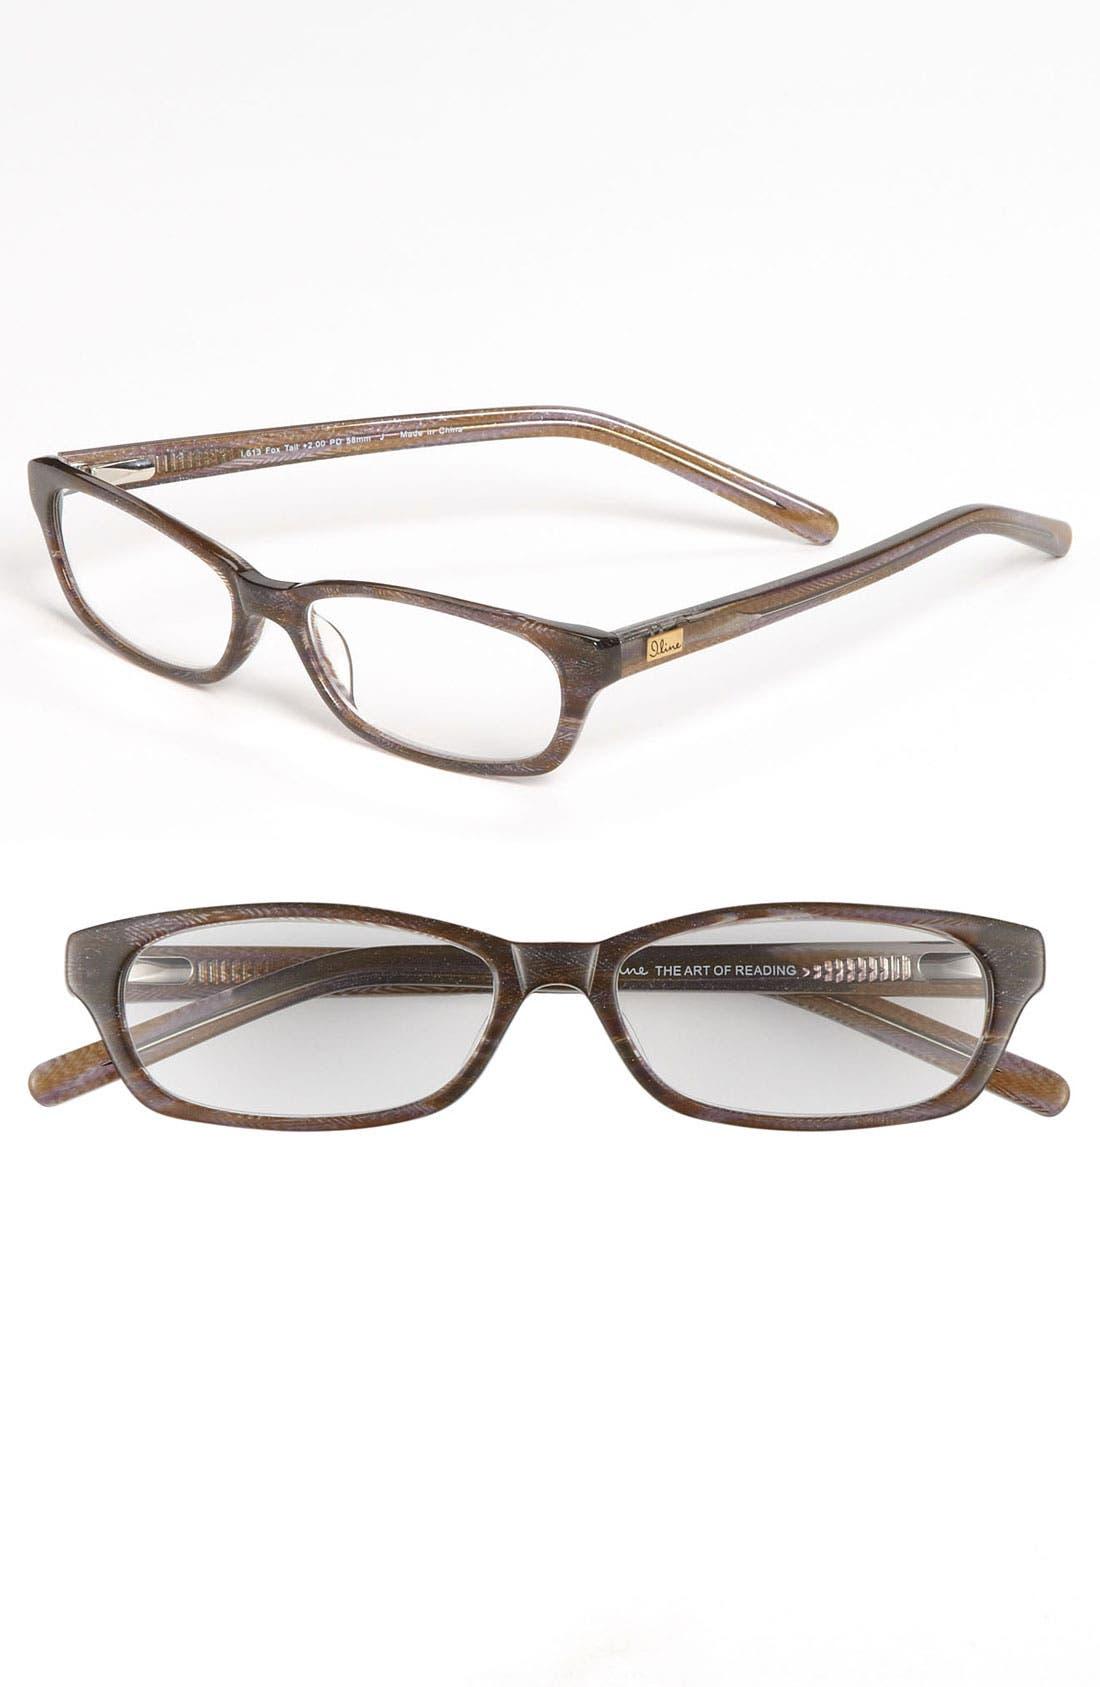 Alternate Image 1 Selected - I Line Eyewear 'Fox Tail' Reading Glasses